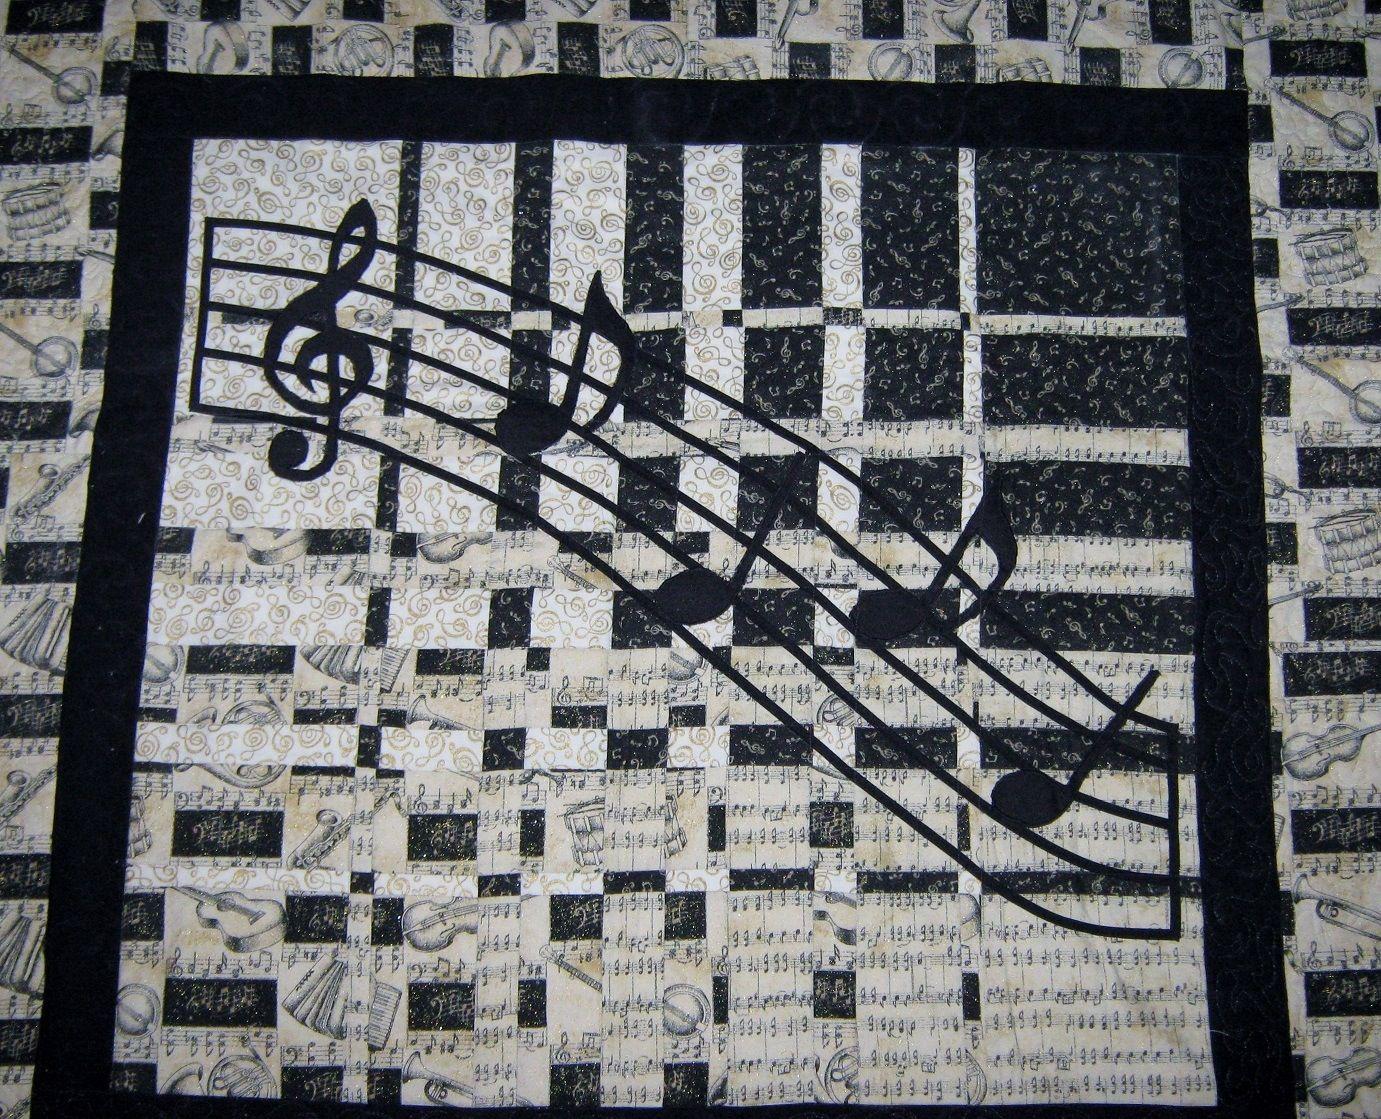 Music quilt idea | Music quilt ideas | Quilts, Quilt